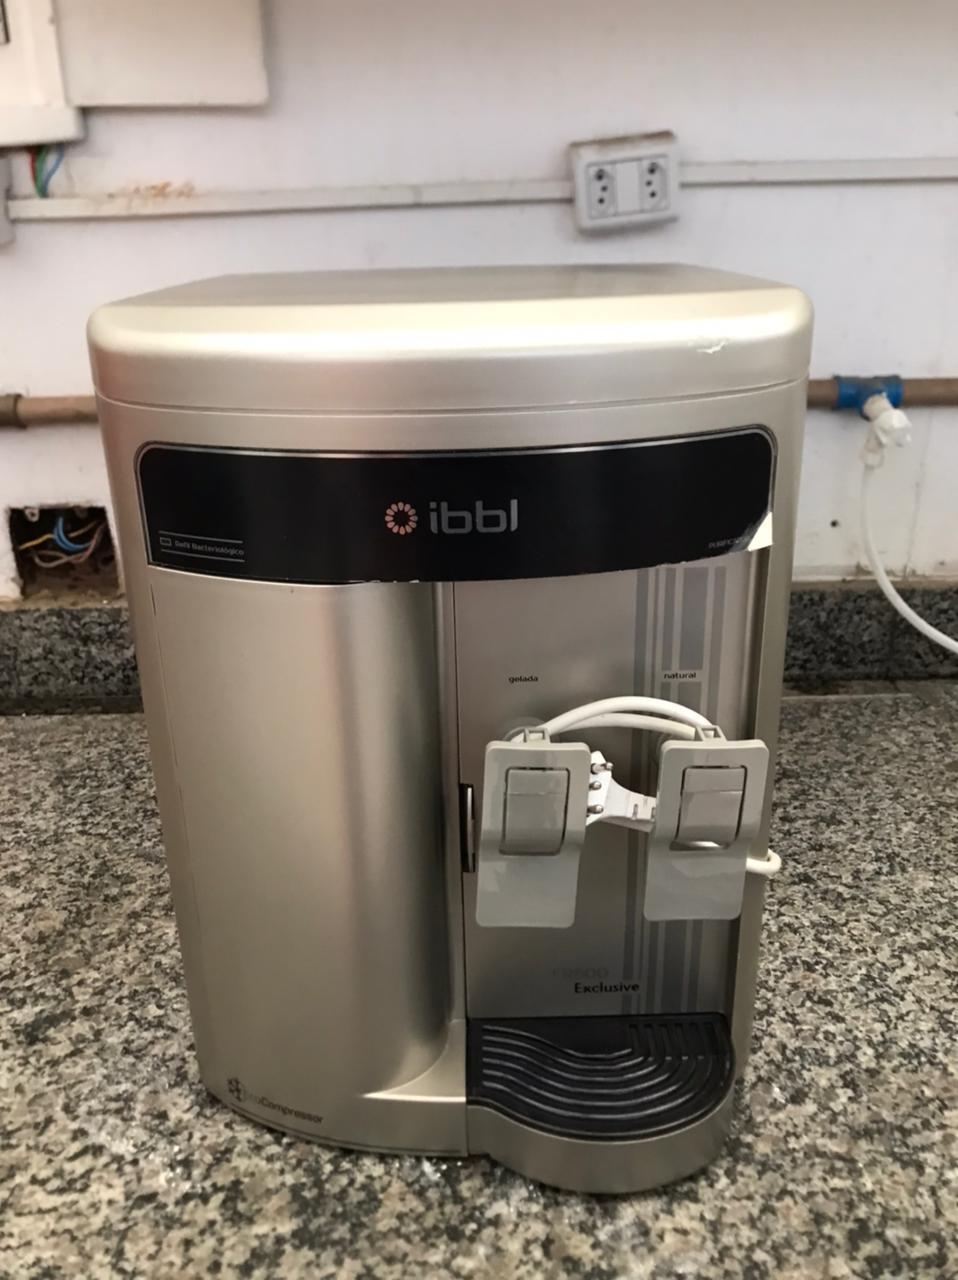 Purificador de Água IBBL FR600 EXCLUSIVE Prata - Semi novo 220v  - My Shop